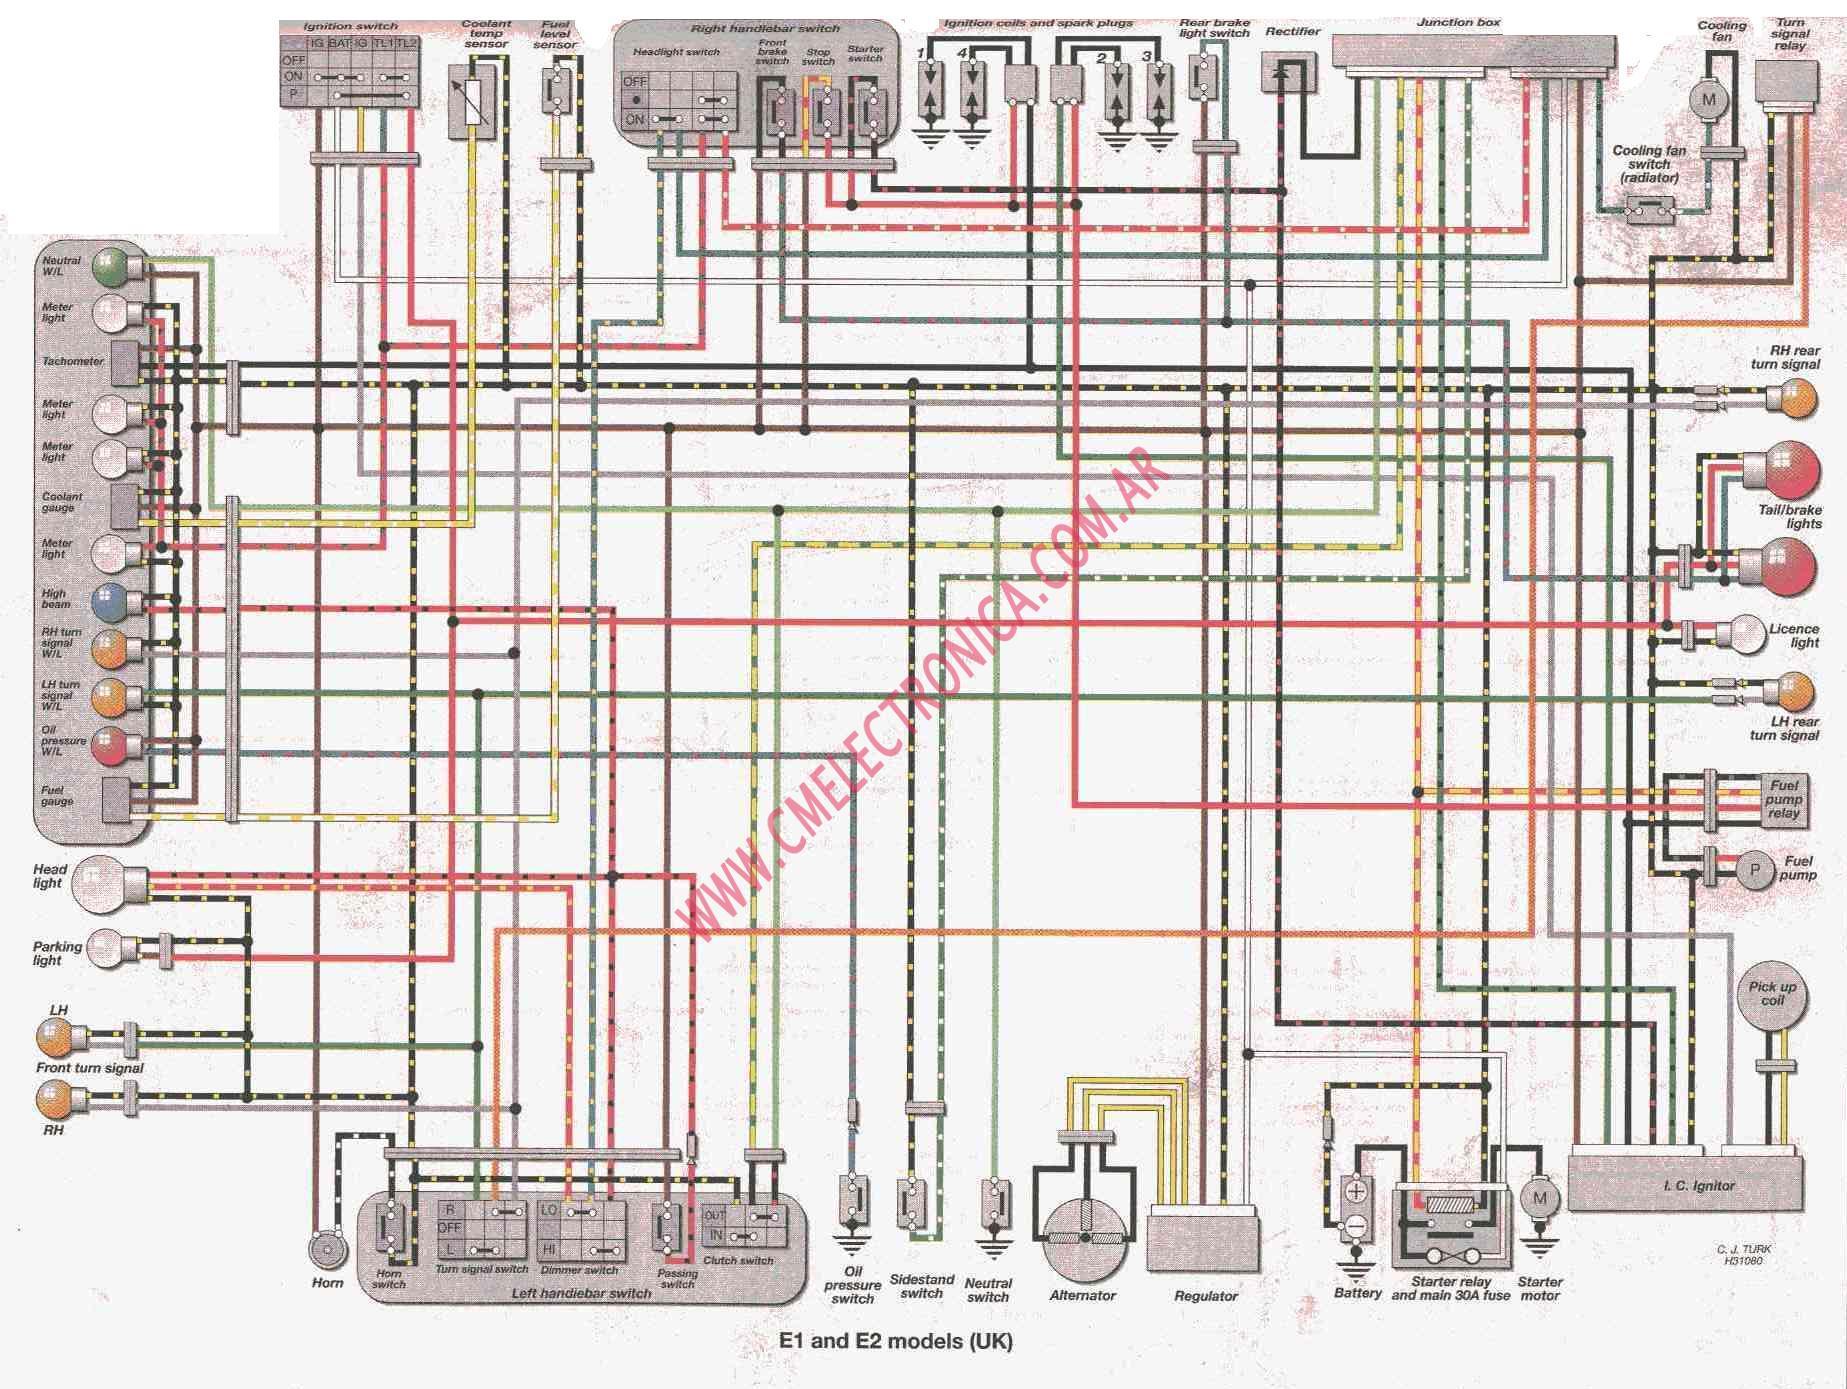 Yamaha R6 Wiring Diagram 93 Schematic Vino 2000 Service Manual Pdf